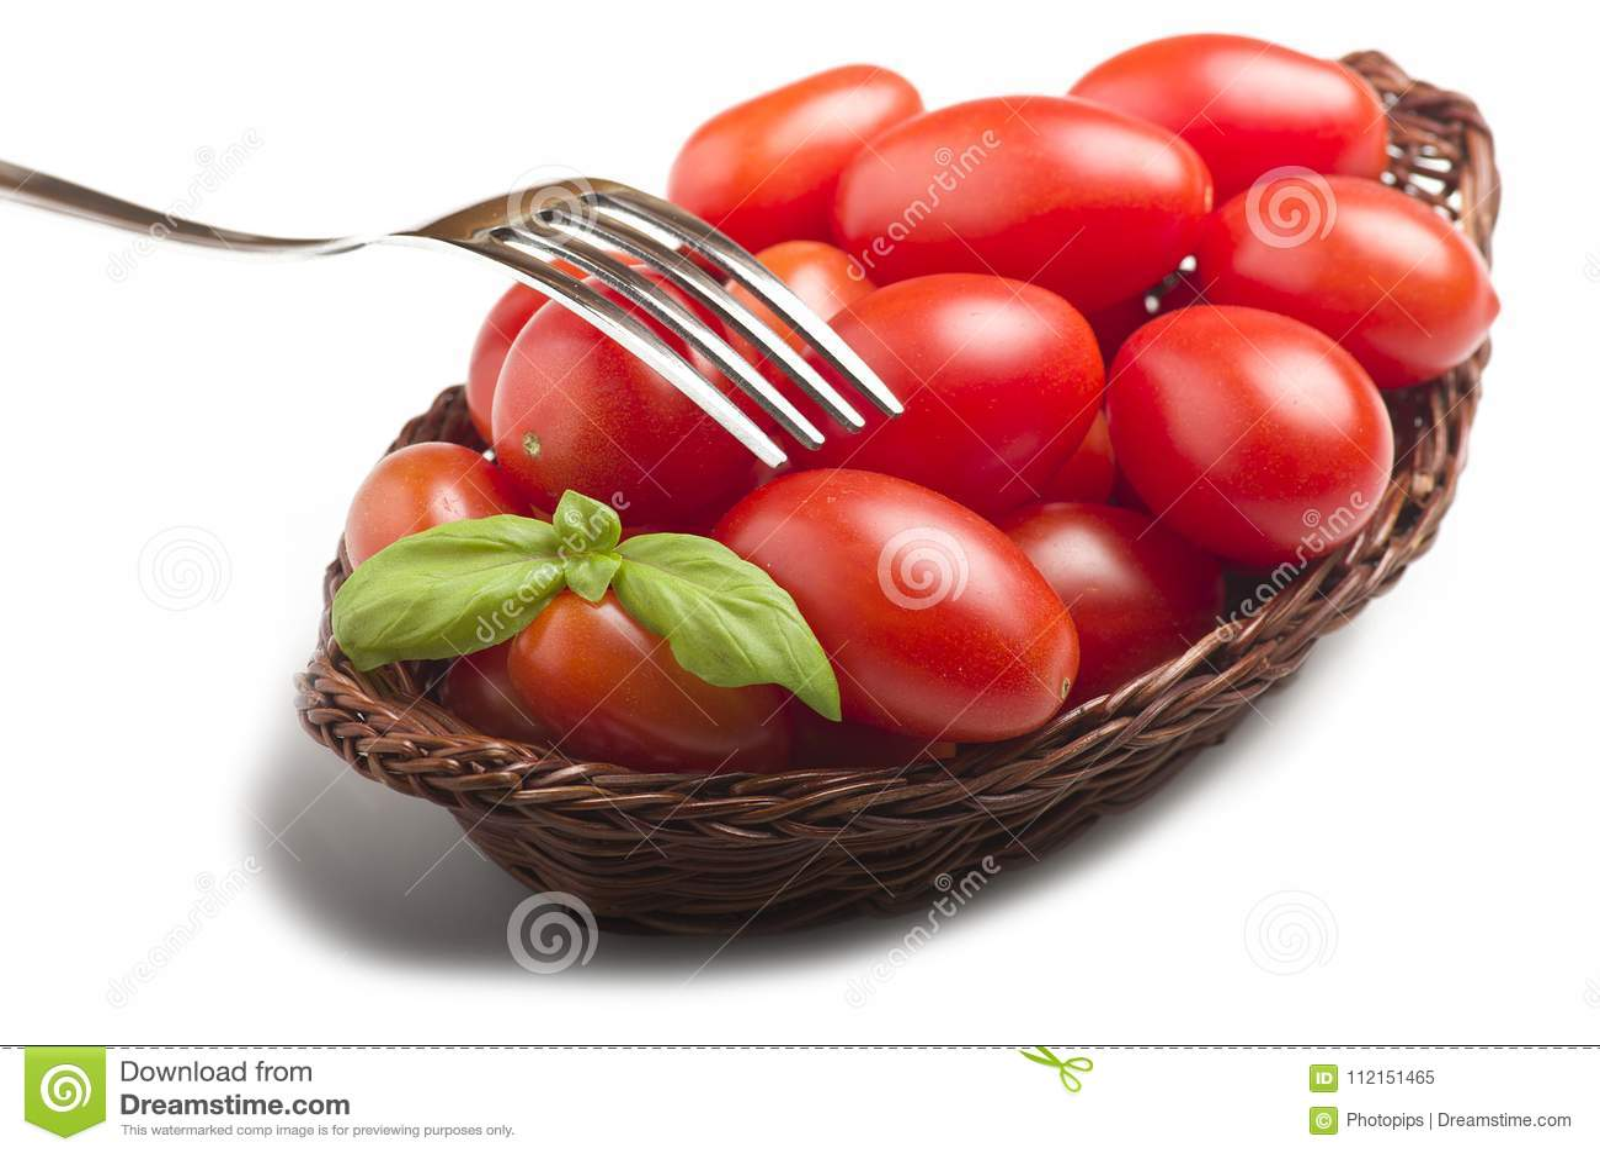 groupe de feuilles de tomate et de basilic image stock. Black Bedroom Furniture Sets. Home Design Ideas